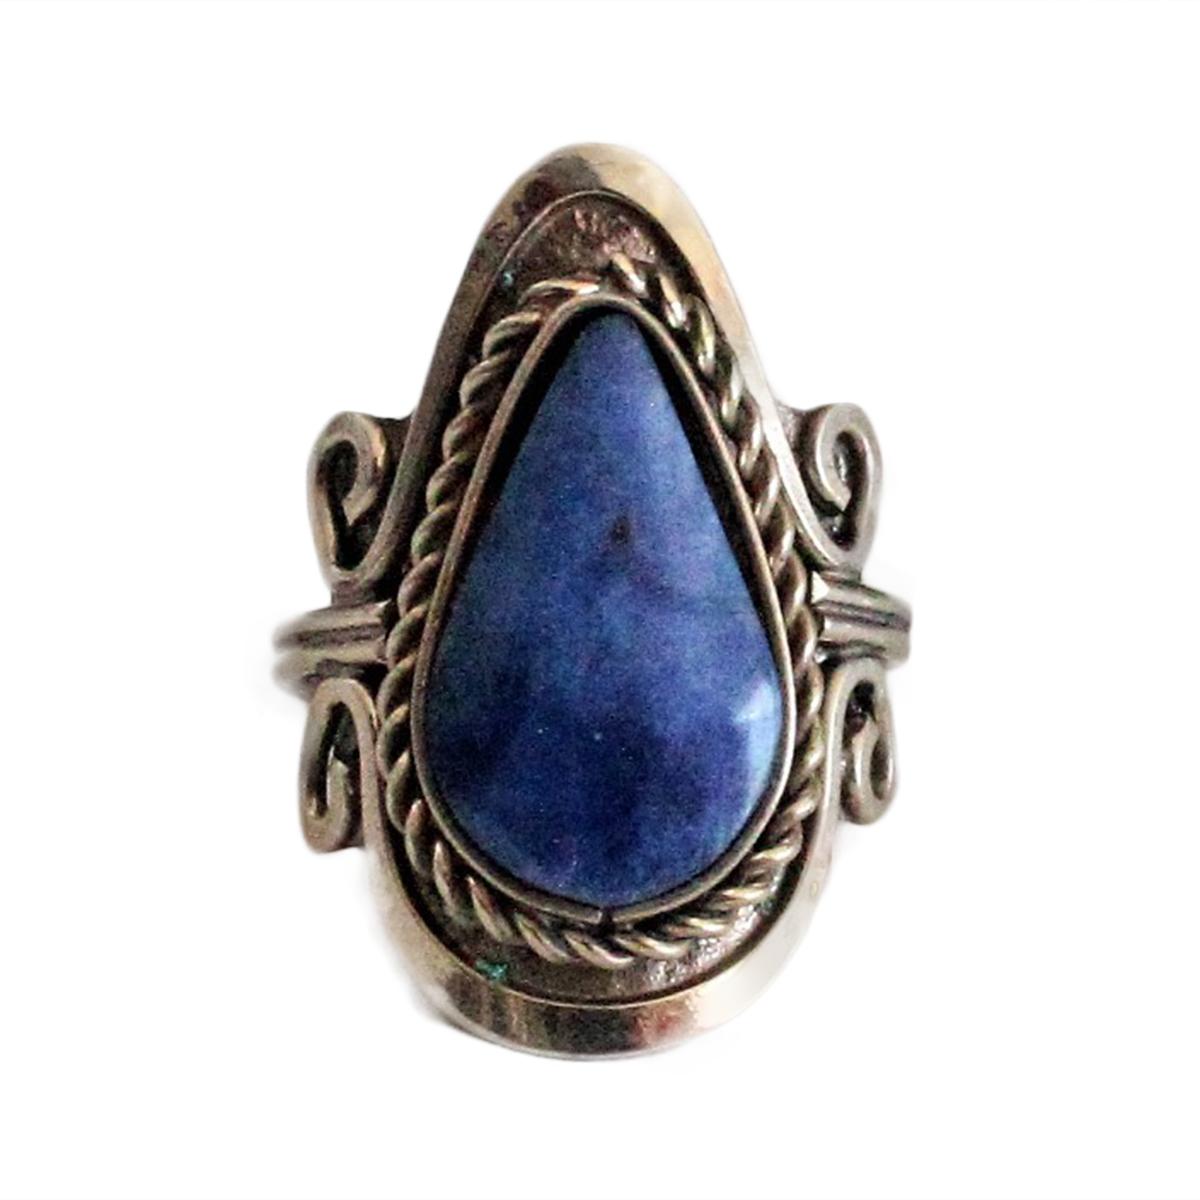 Bague Pierres Semi-précieuses-Lapis-lazuli